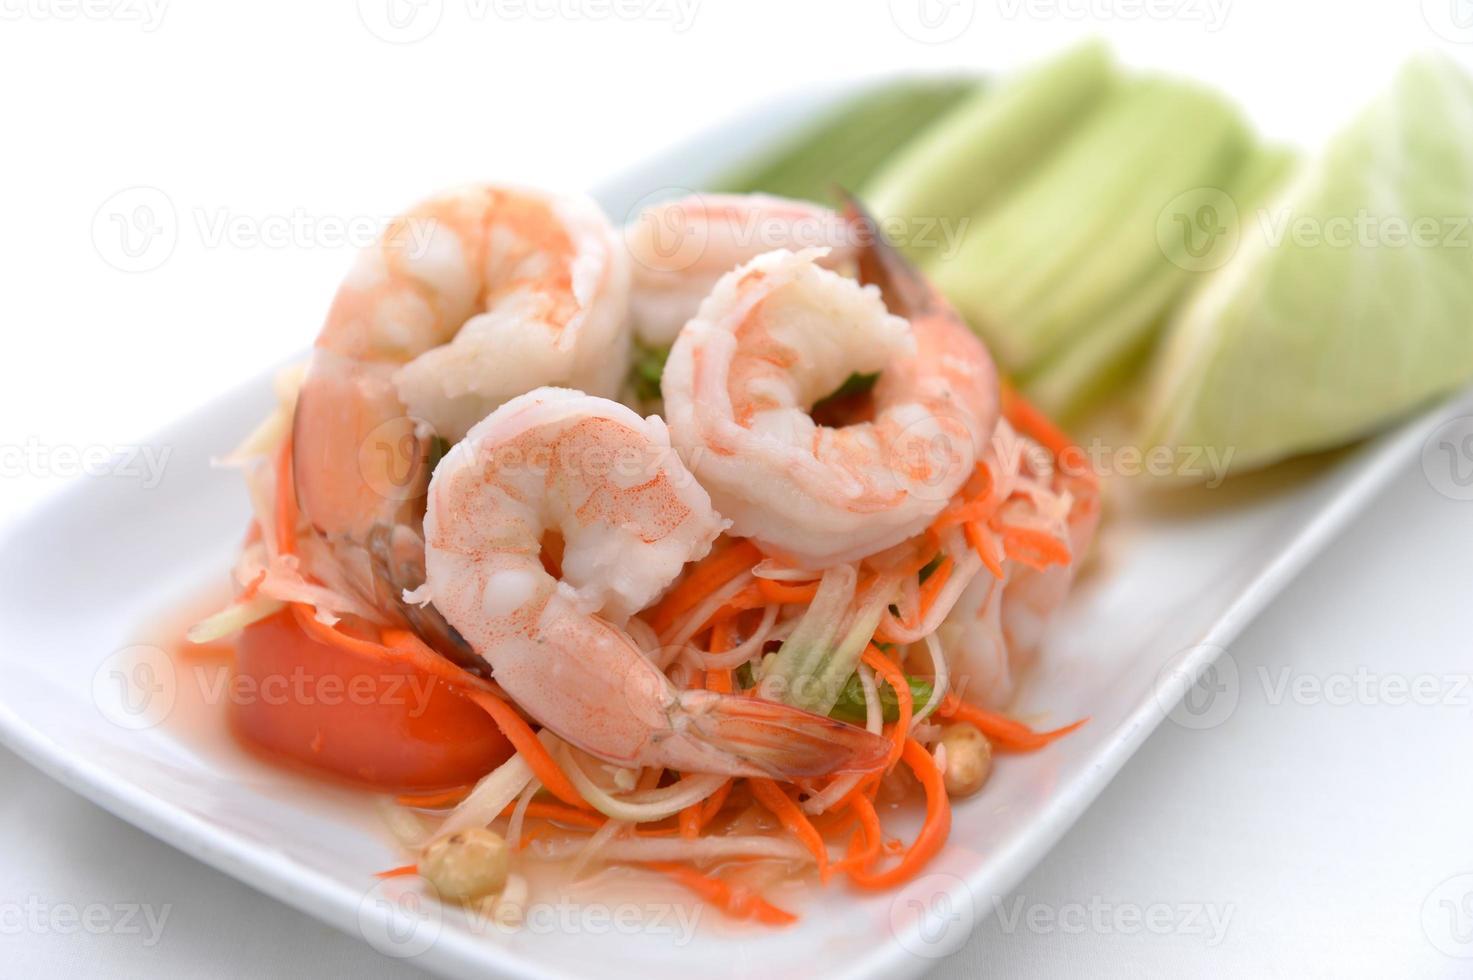 papajasalade (traditioneel en modern Thais eten) foto